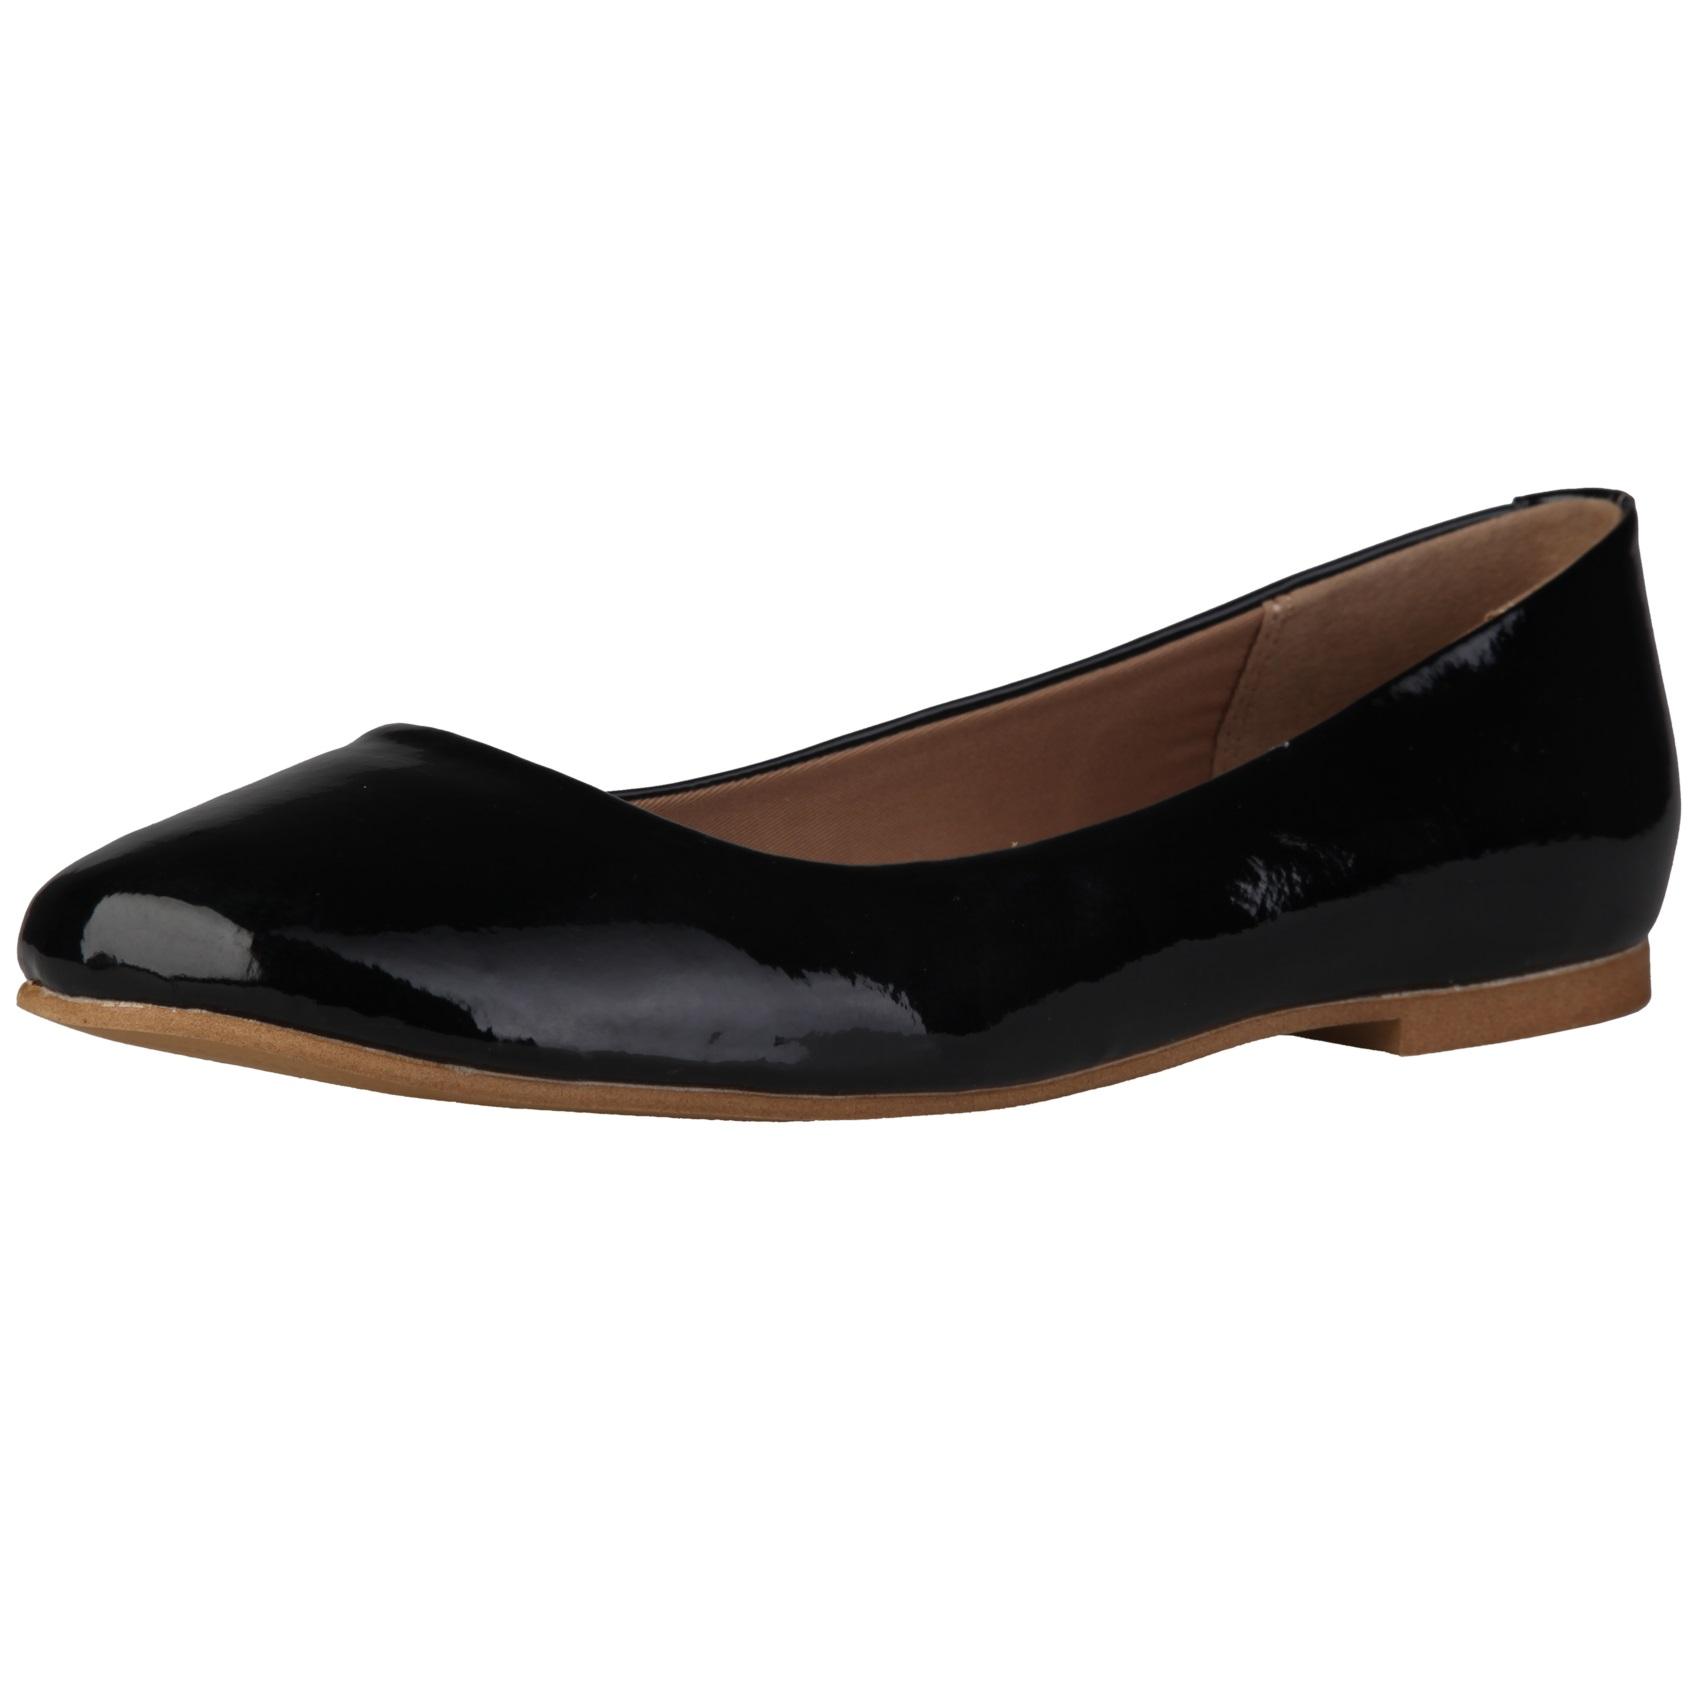 Sofia Loes Flat Shoes Black Rf600152